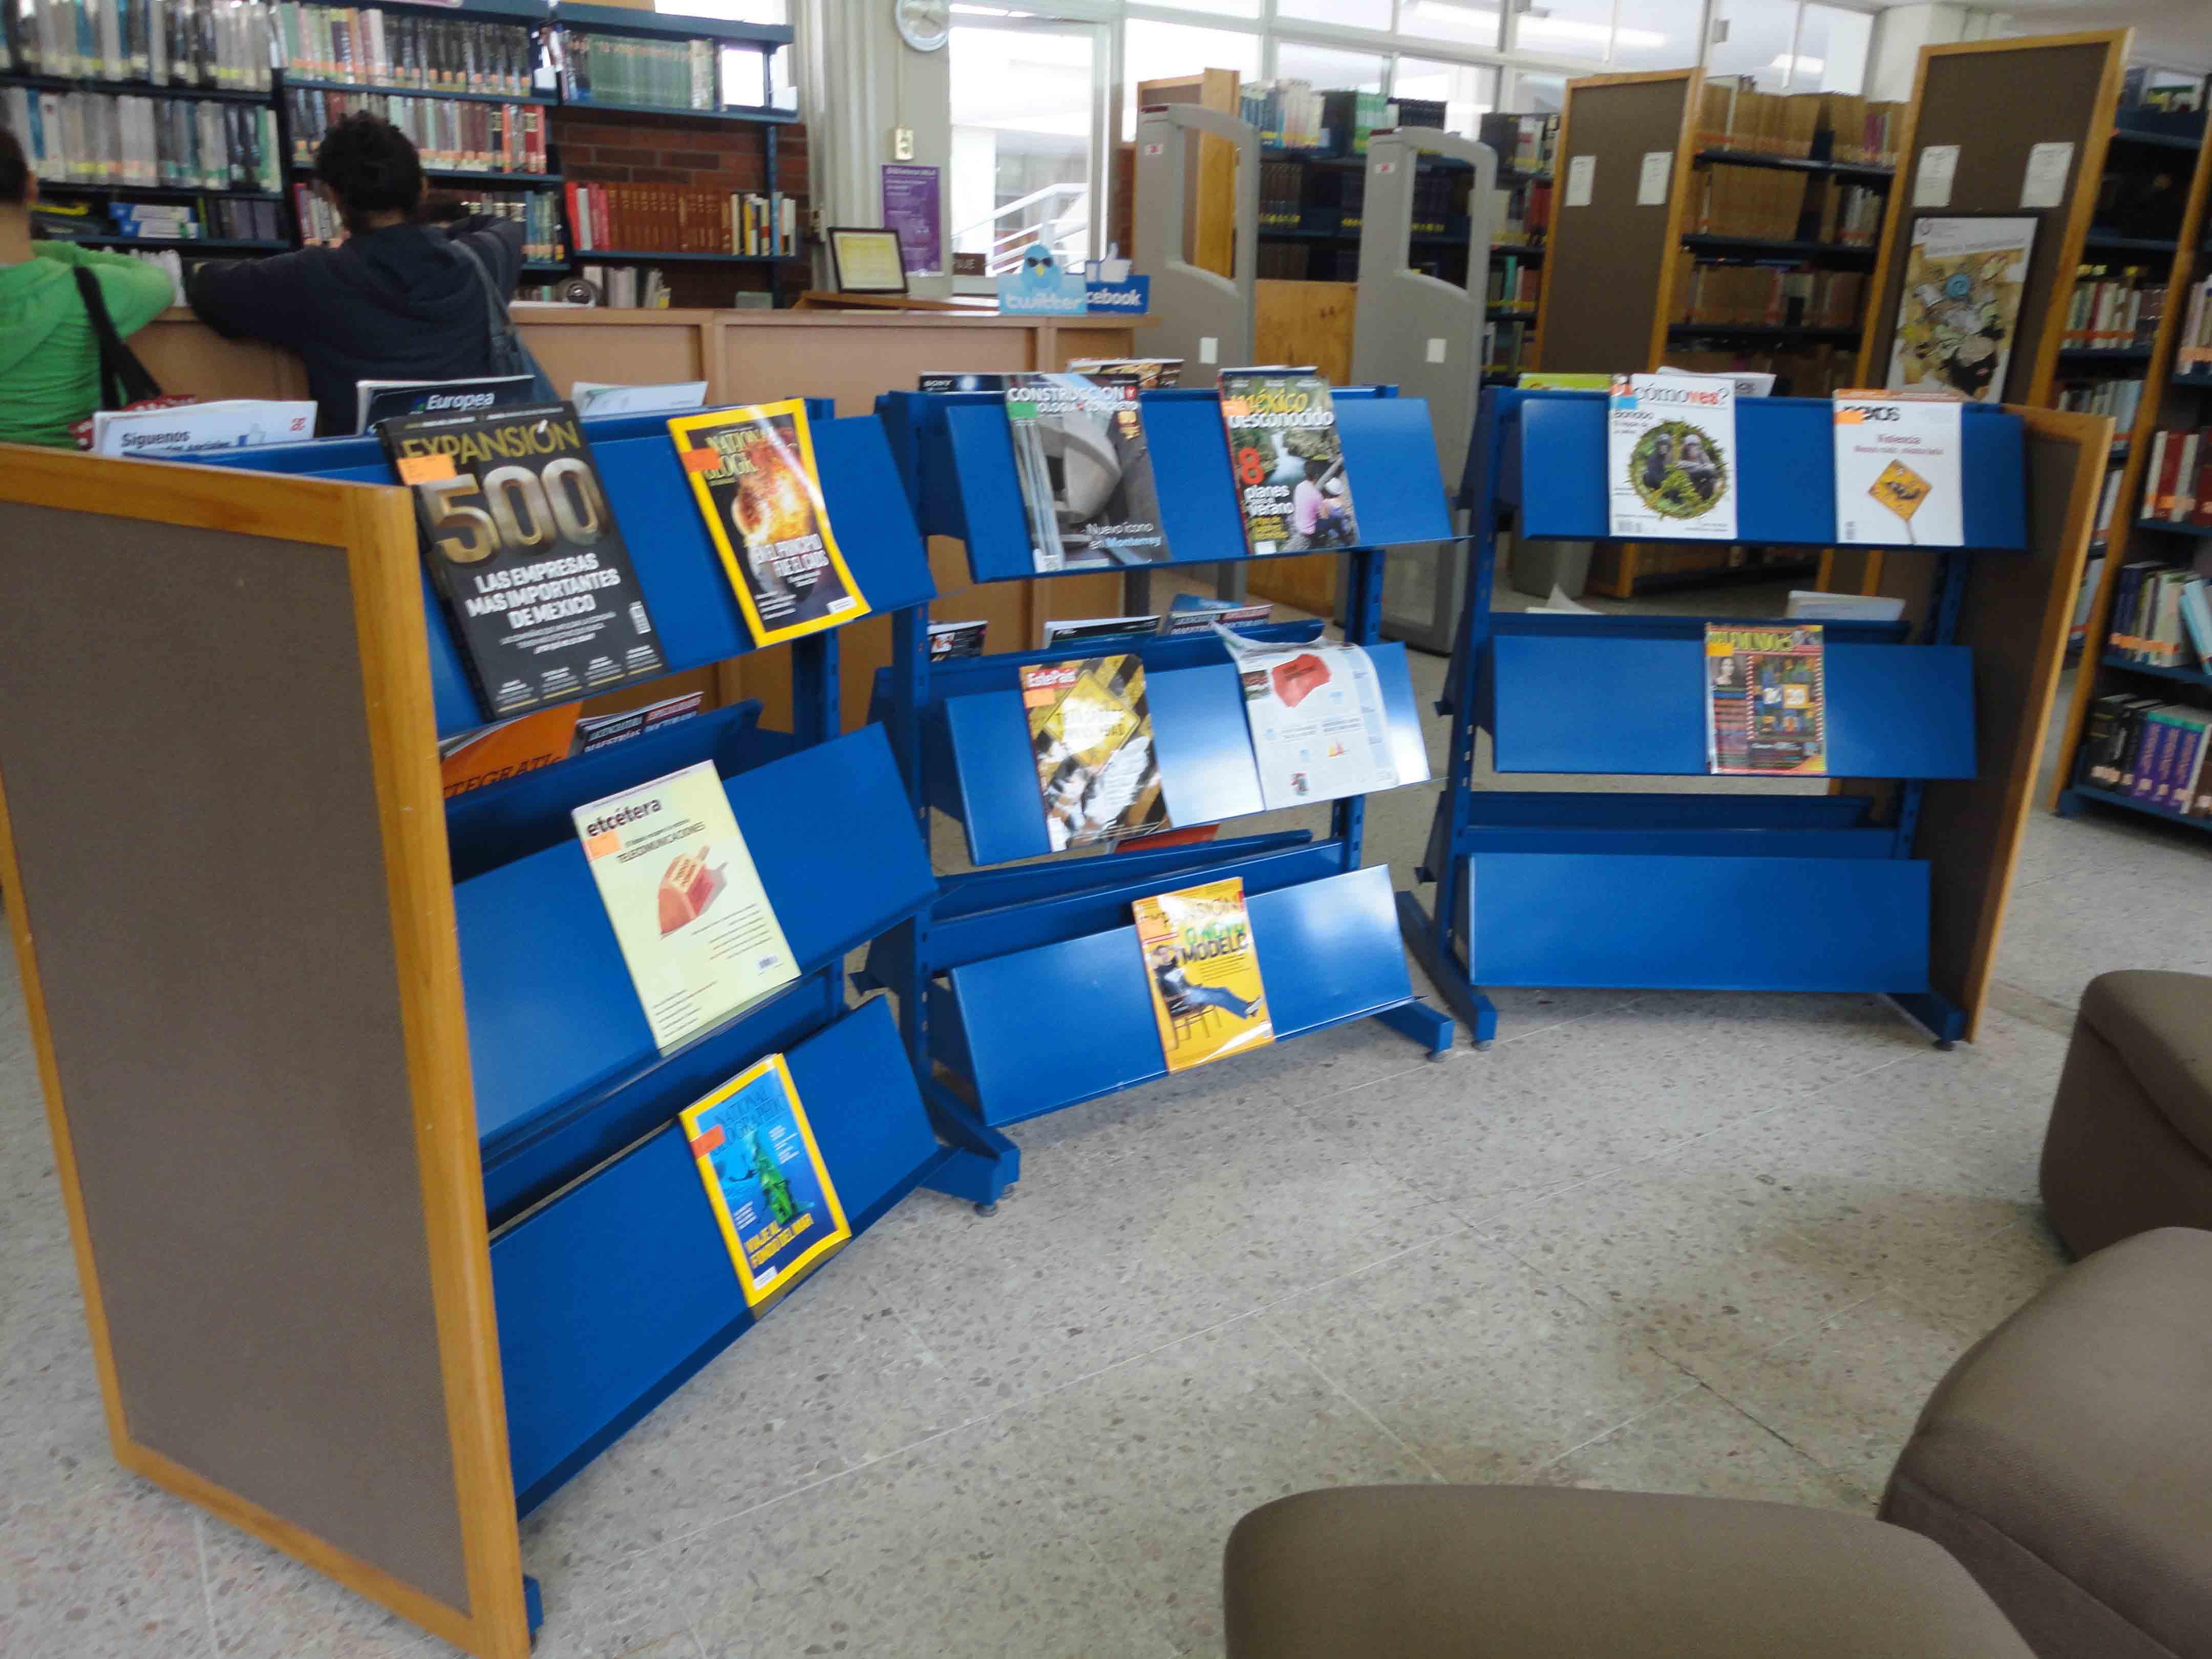 Zamosa S A De C V  # Muebles Educativos